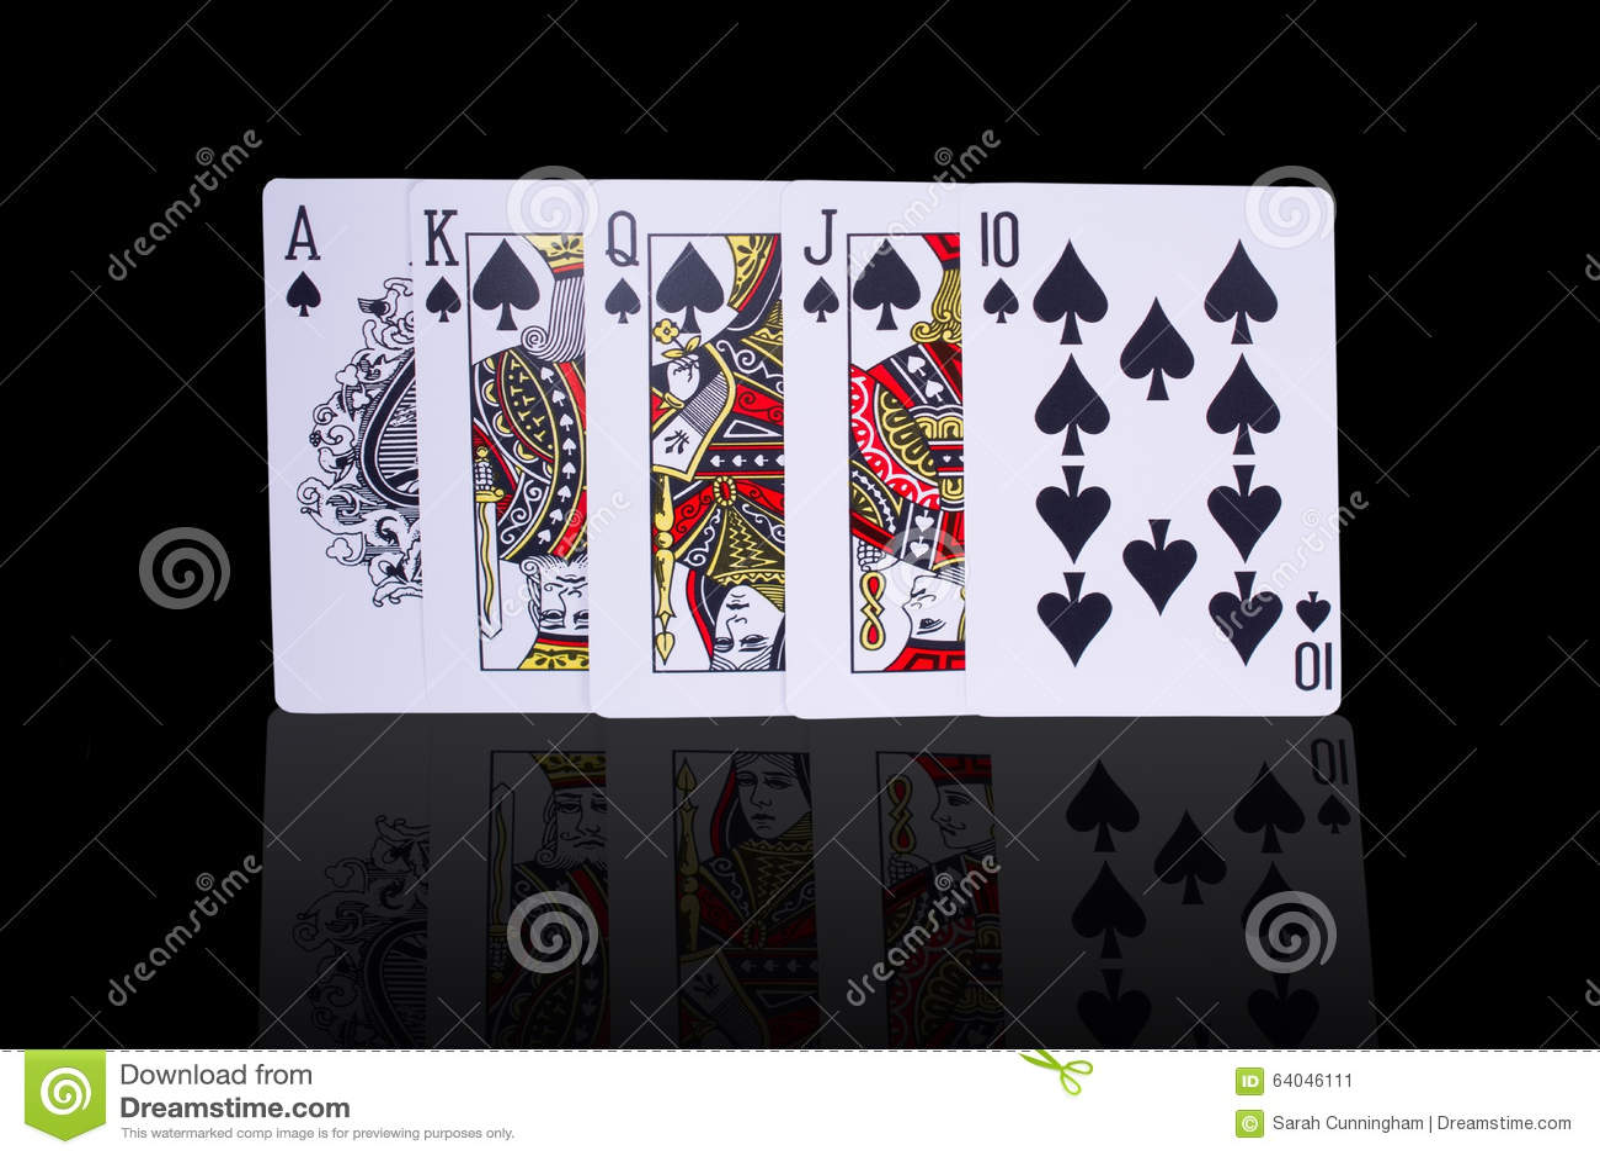 Poker Royal Flush Playing Cards Stock Image Image Of Hand Game 64046111